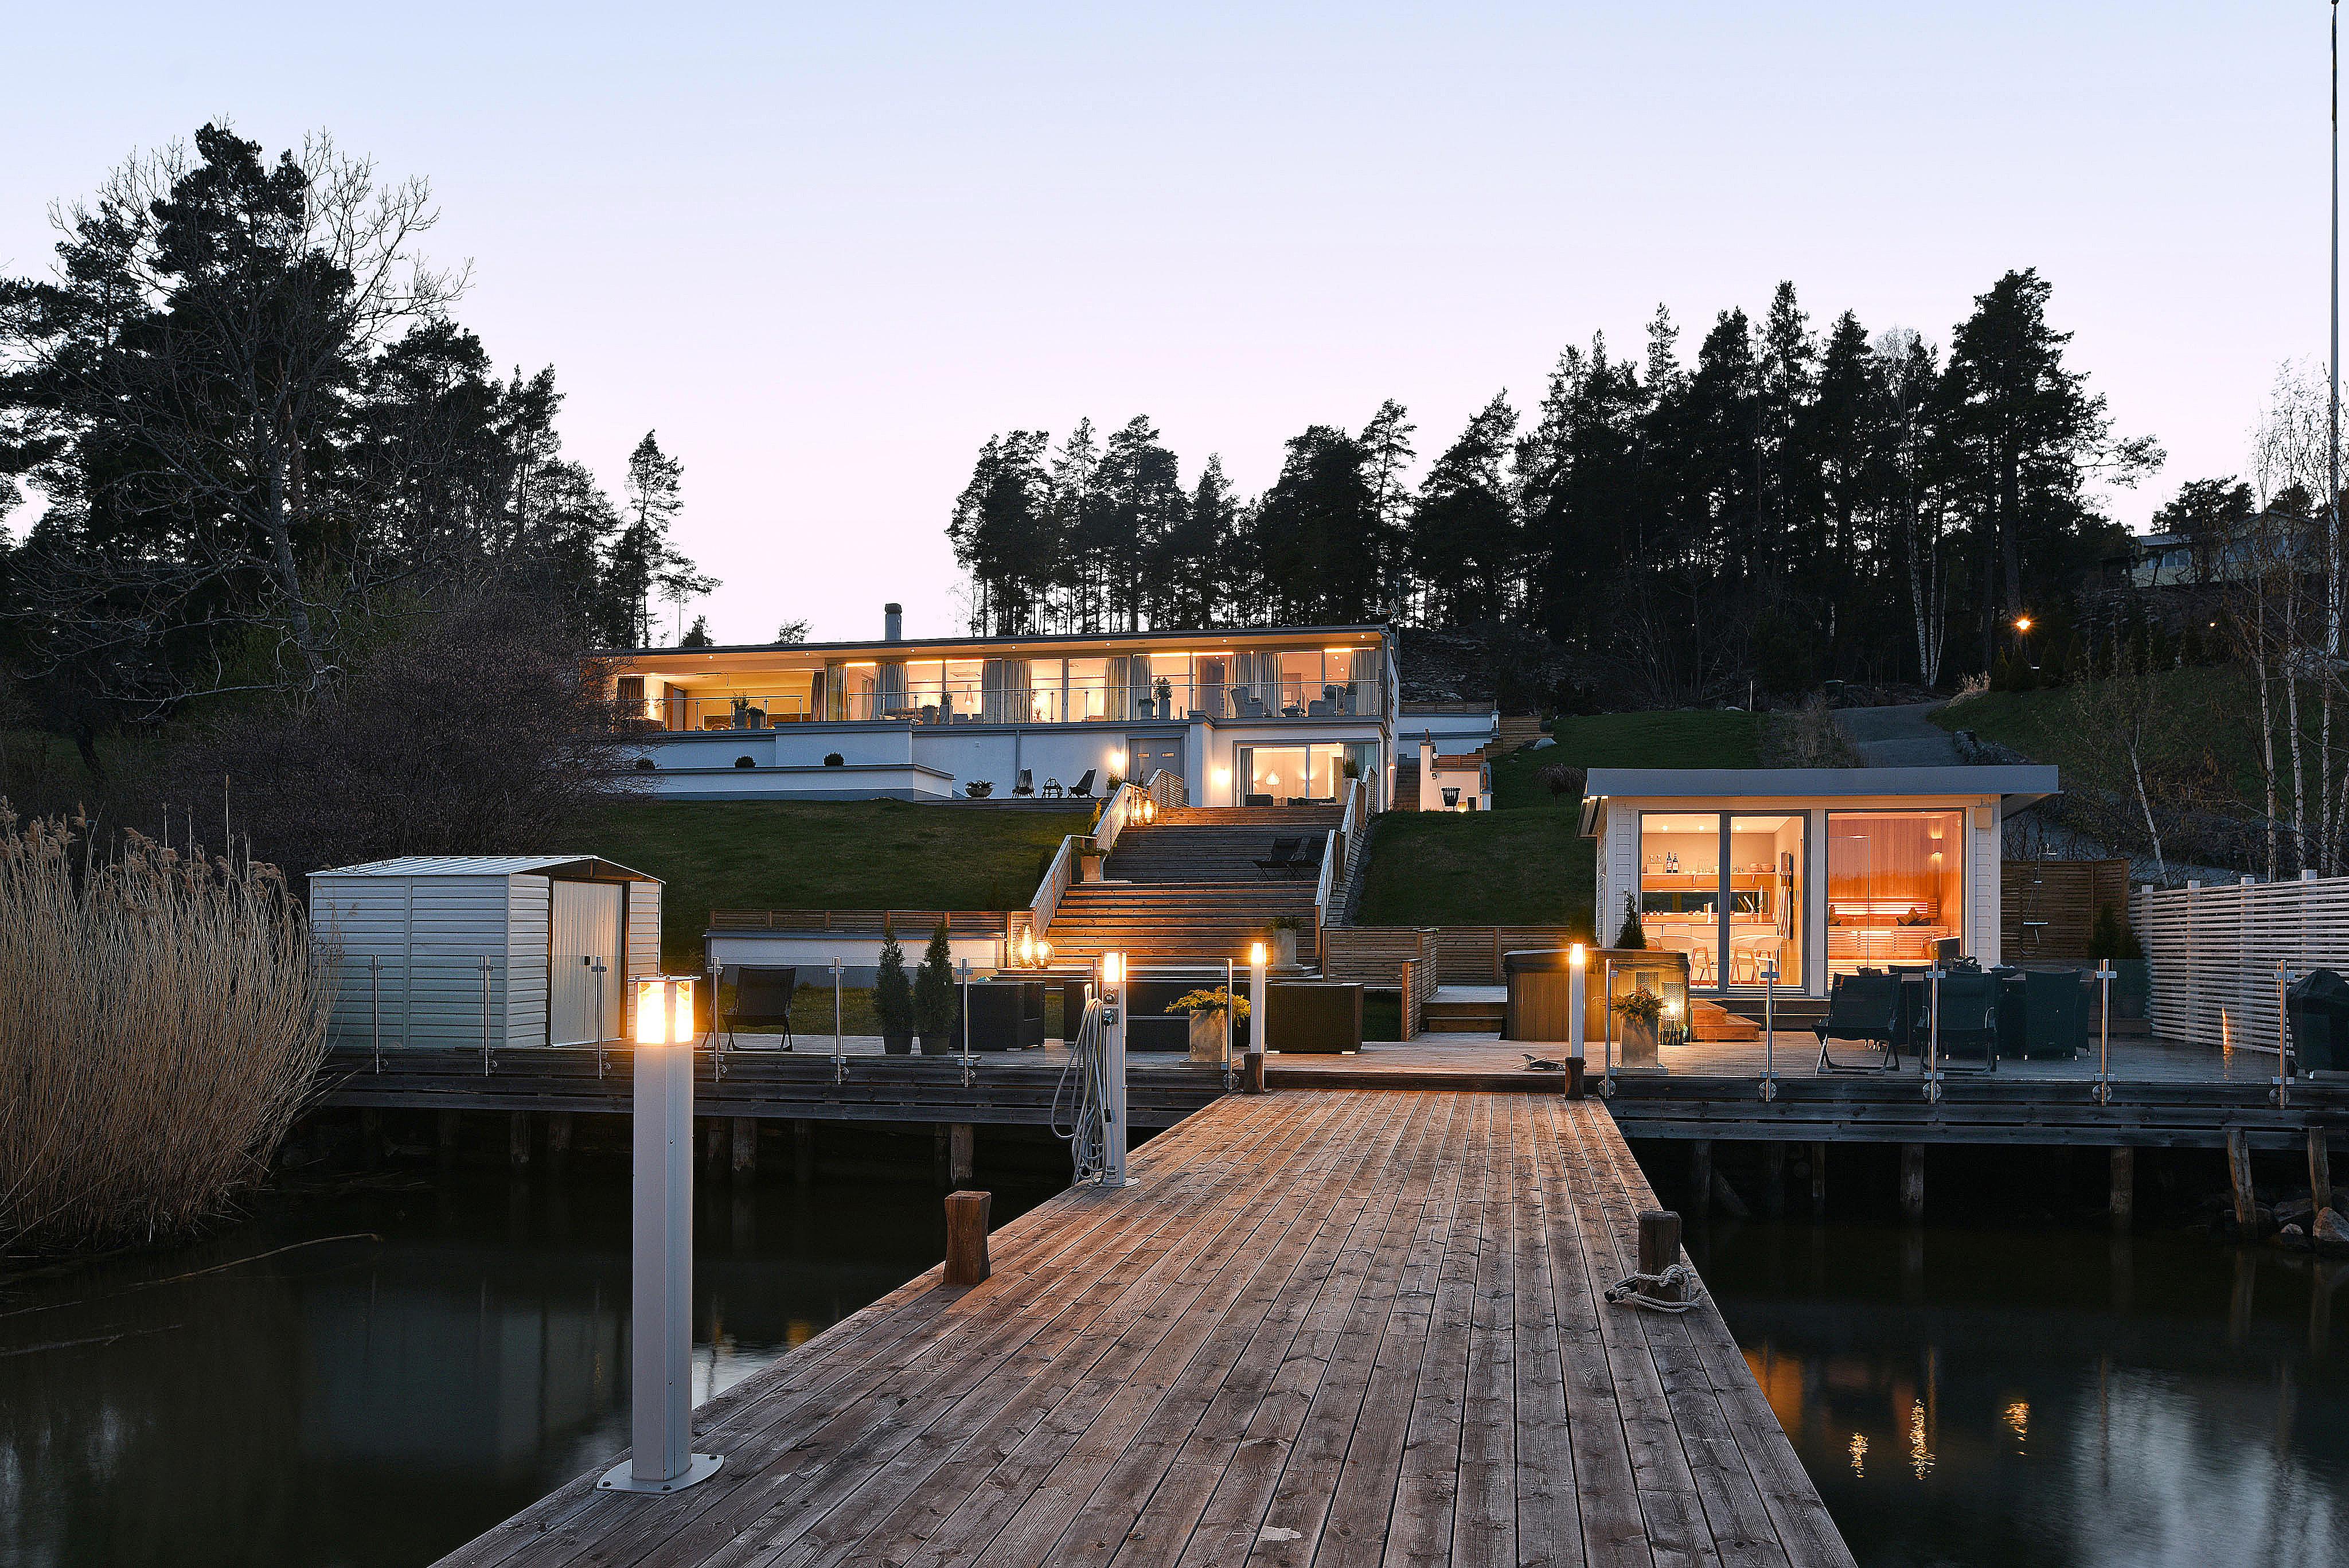 Flaxenviks bryggväg – Sturegatan 58 – Skeppsholmen Sotheby's International Realty